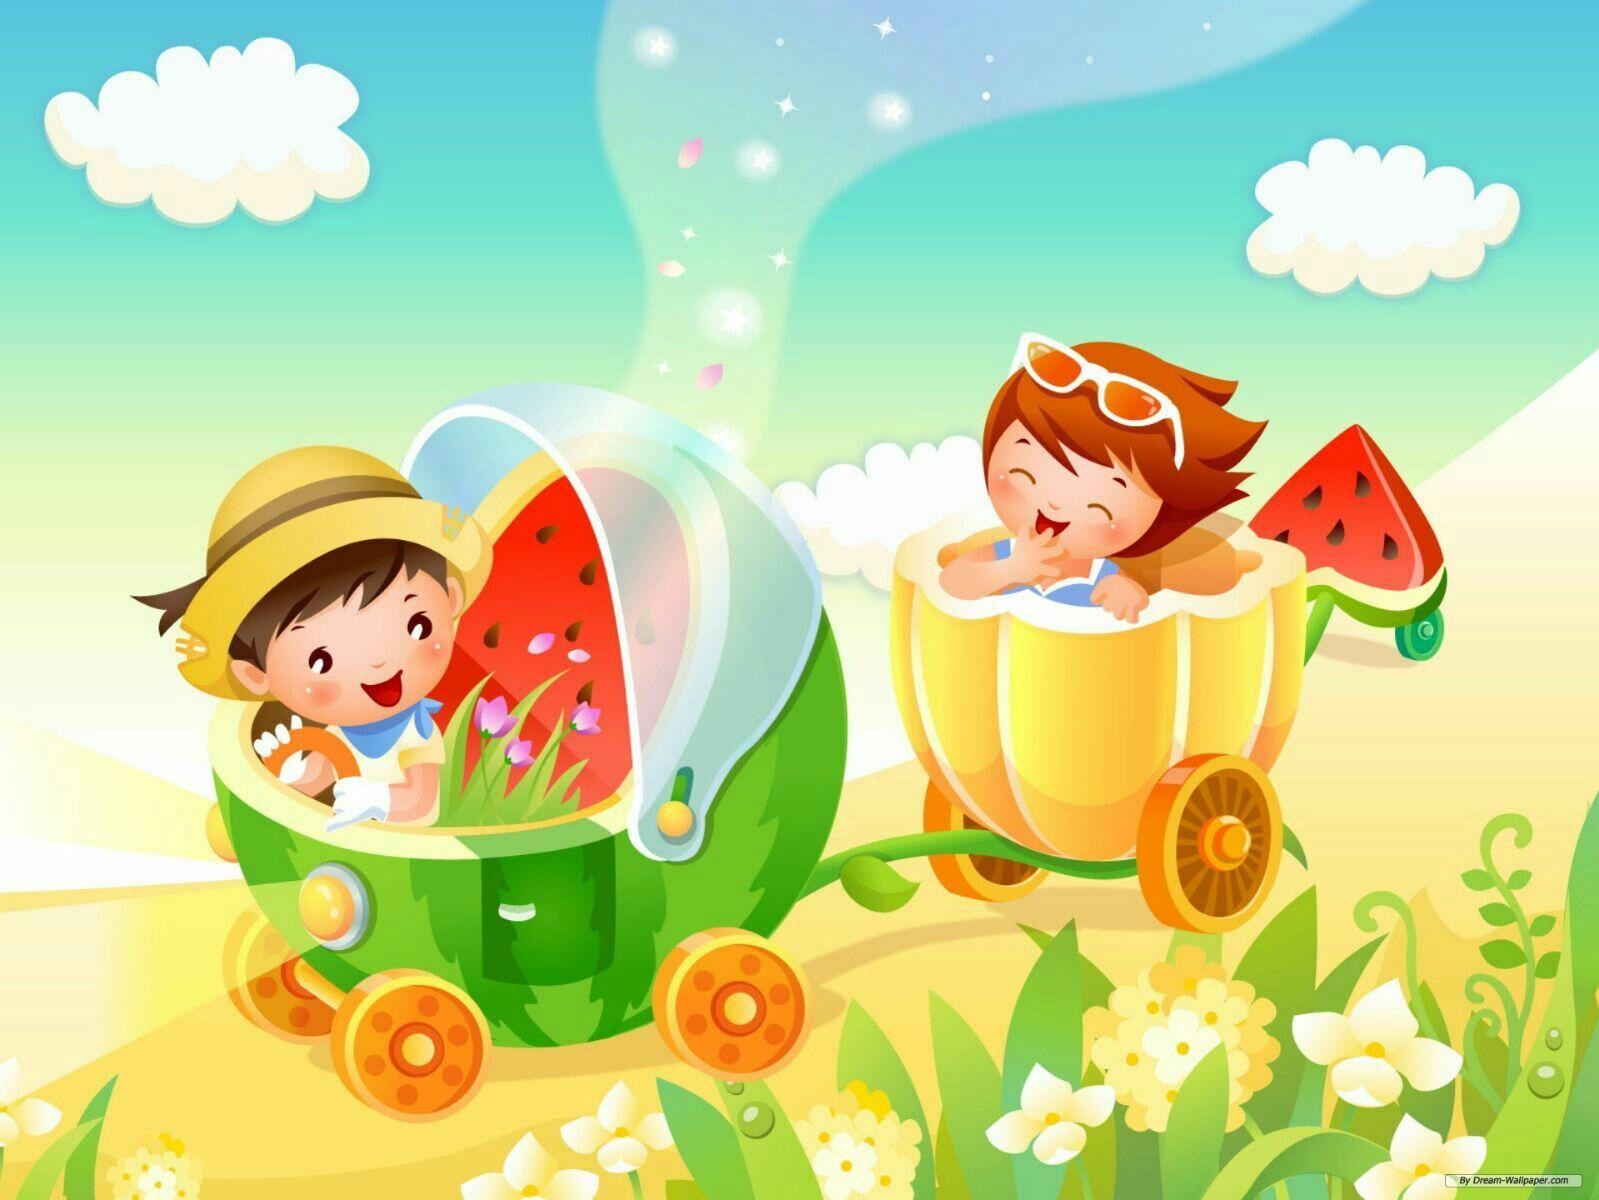 Imágenes para portadas Laminas infantiles, Fondos de